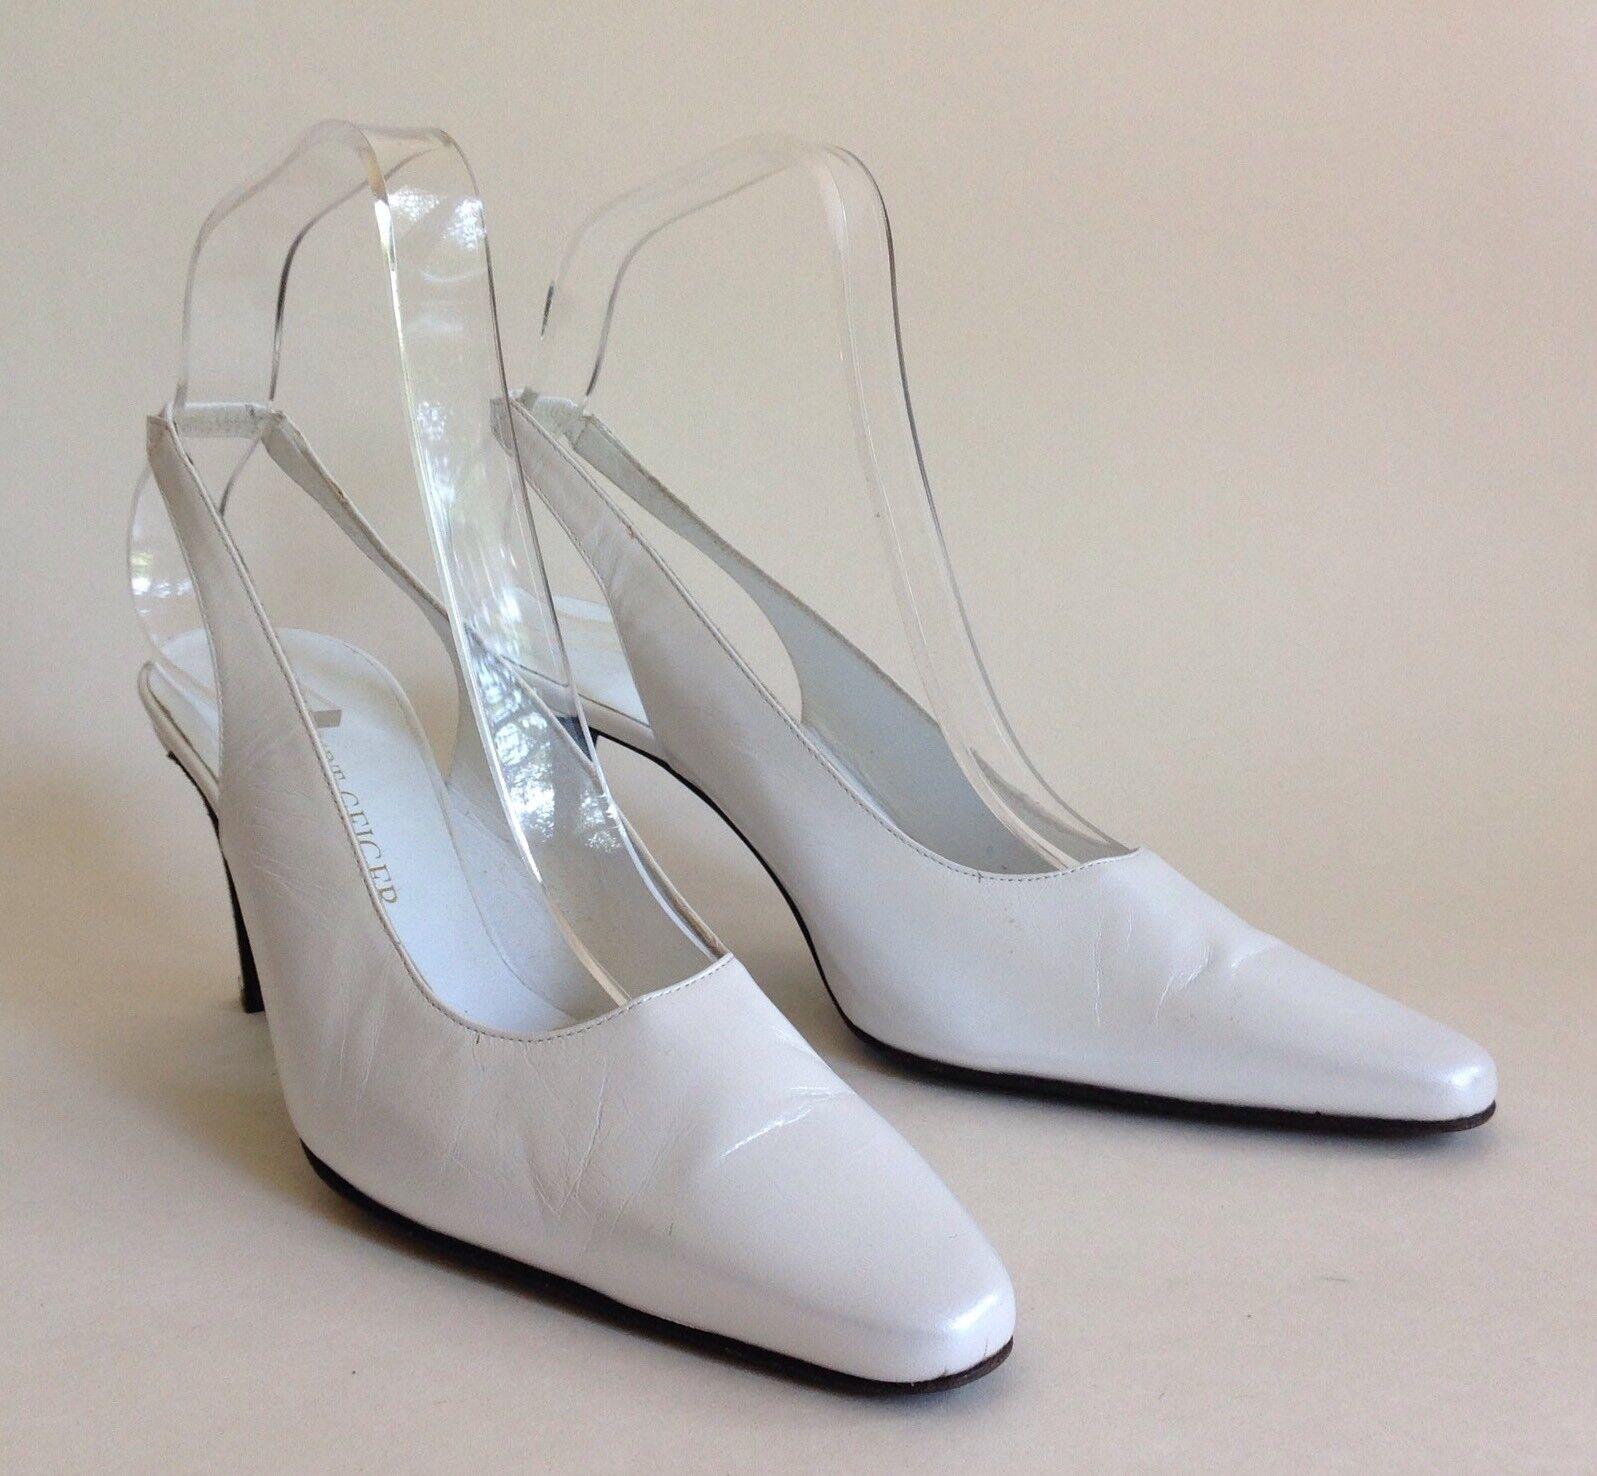 Kurt Geiger Slingback shoes UK 3.5 Pearl White Leather 3.25  Slim Heel Wedding